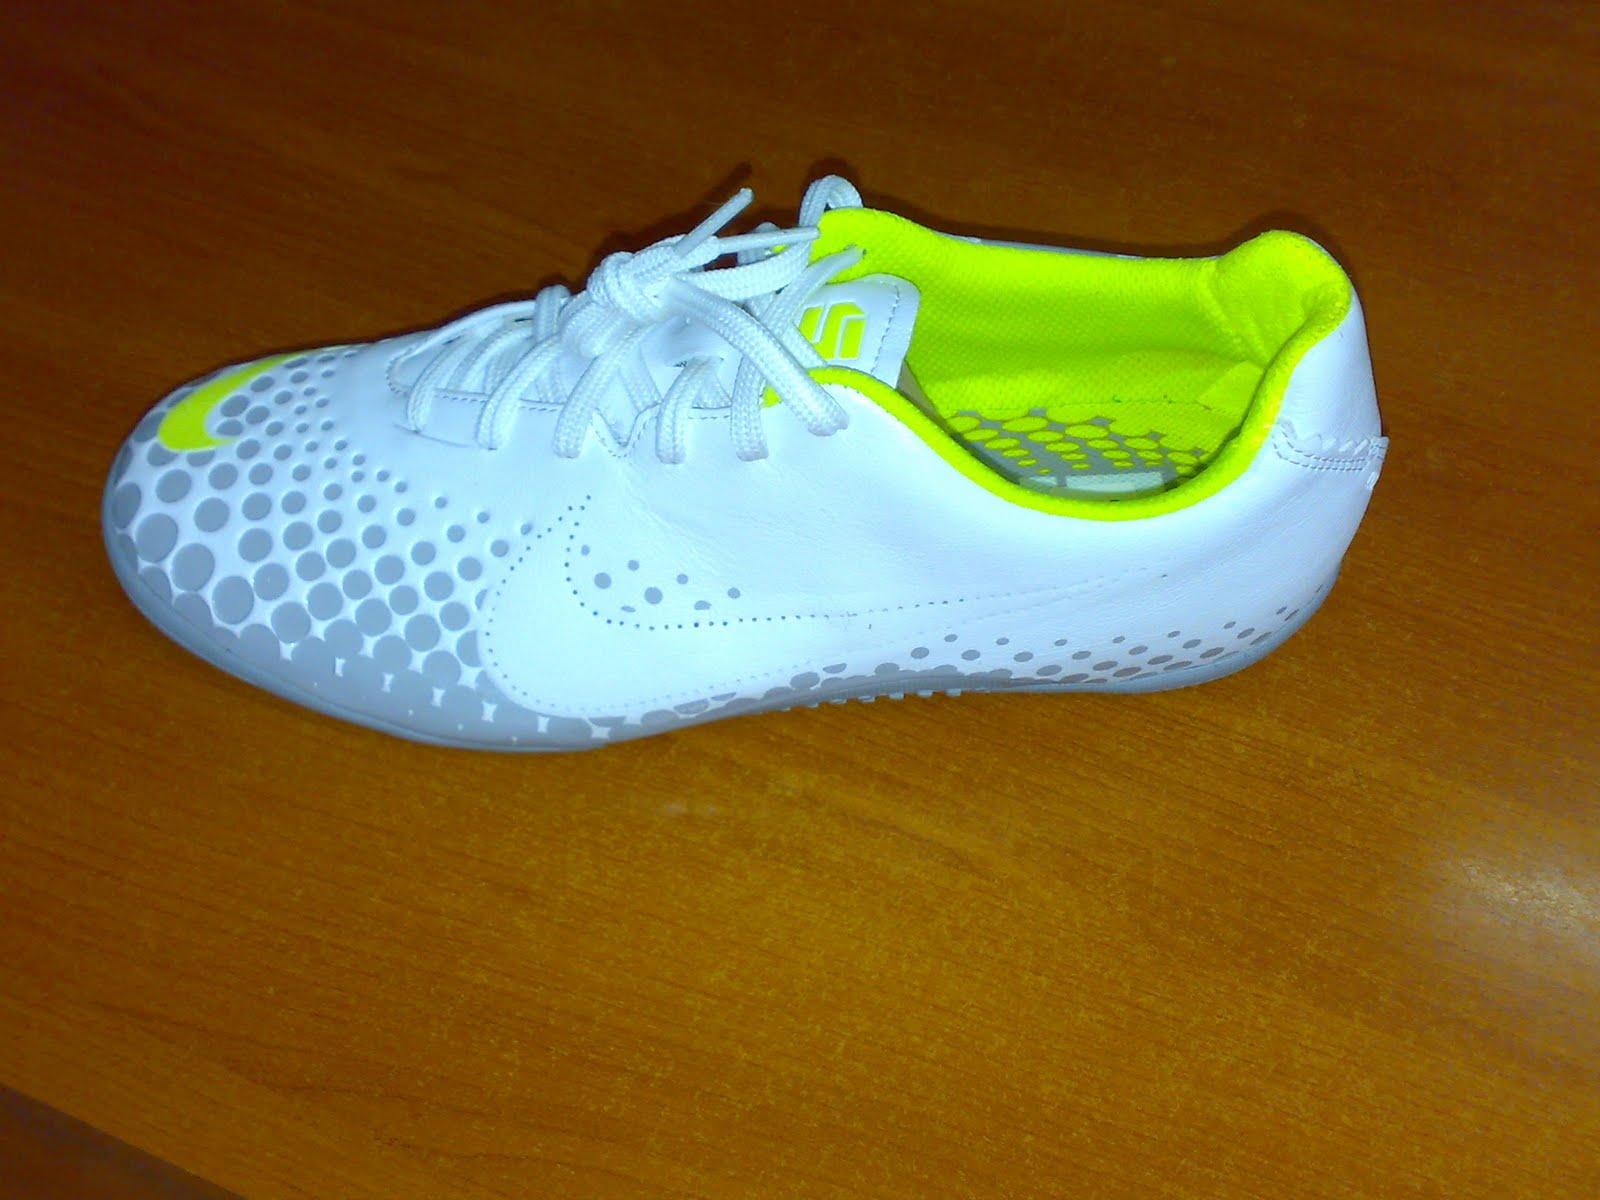 ... italy sepatu futsal murah original nike adidas diadora lotto puma 63ce4  d5ca4 7ecb4af216